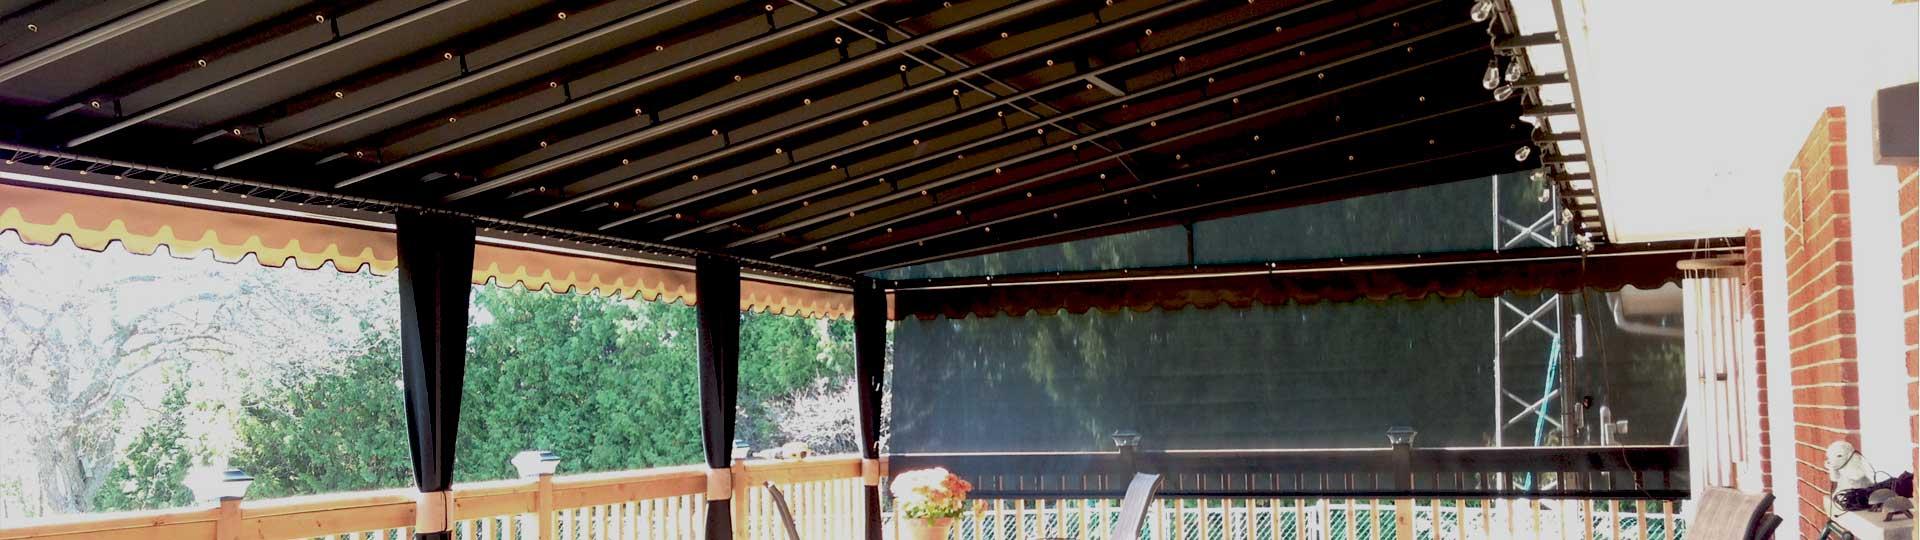 Awning framework fabrics superior awning fabrics for Garden decking framework